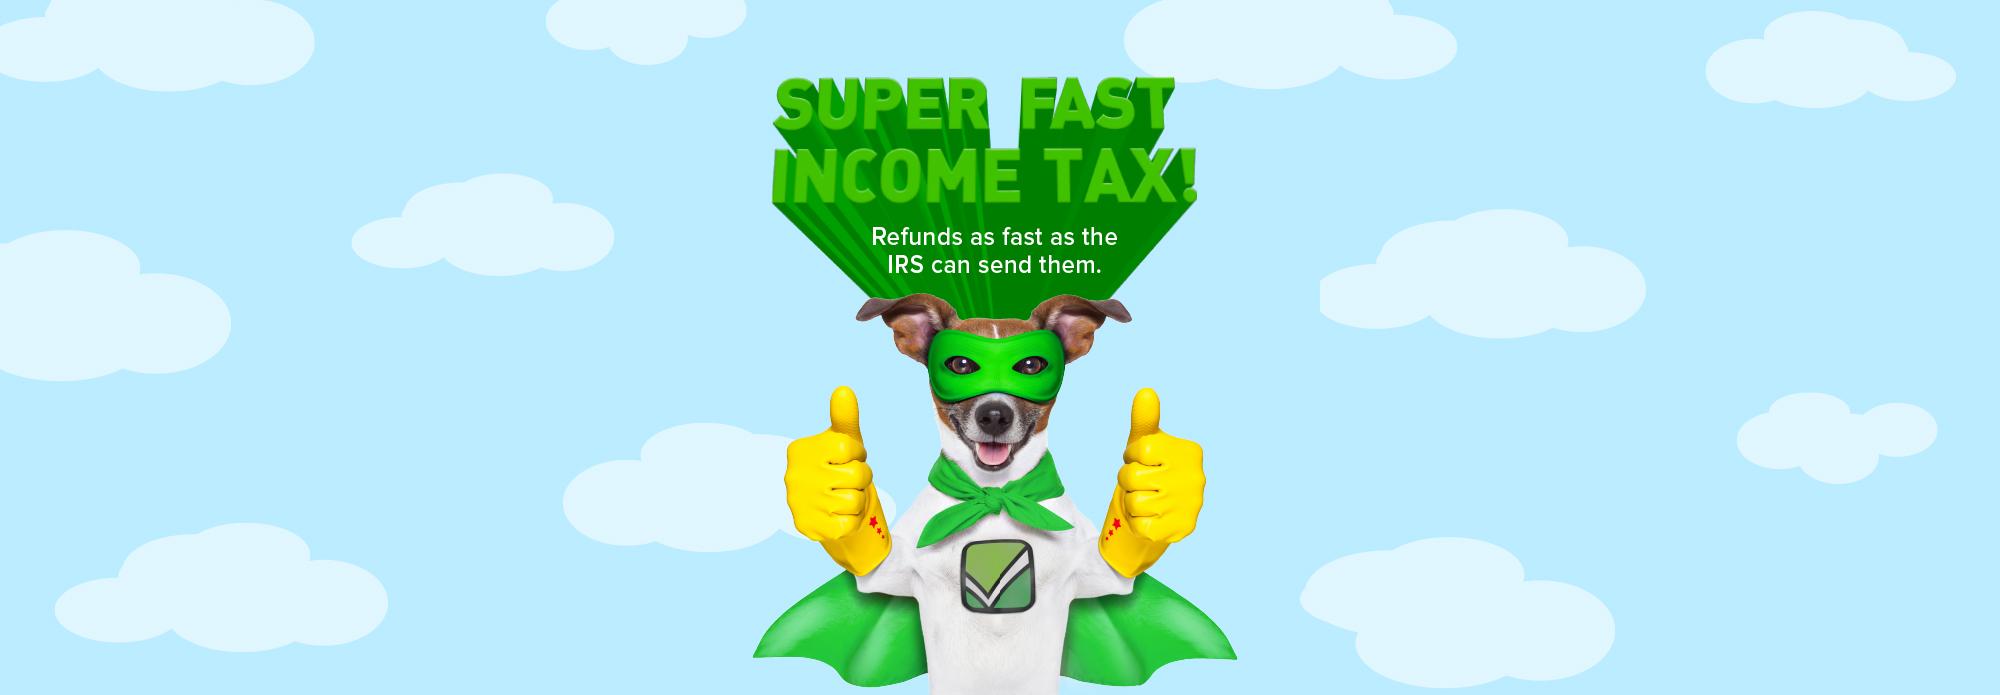 Puma_Accounting_Professional_Income_Tax-header-Super_Fast_Hero.jpg